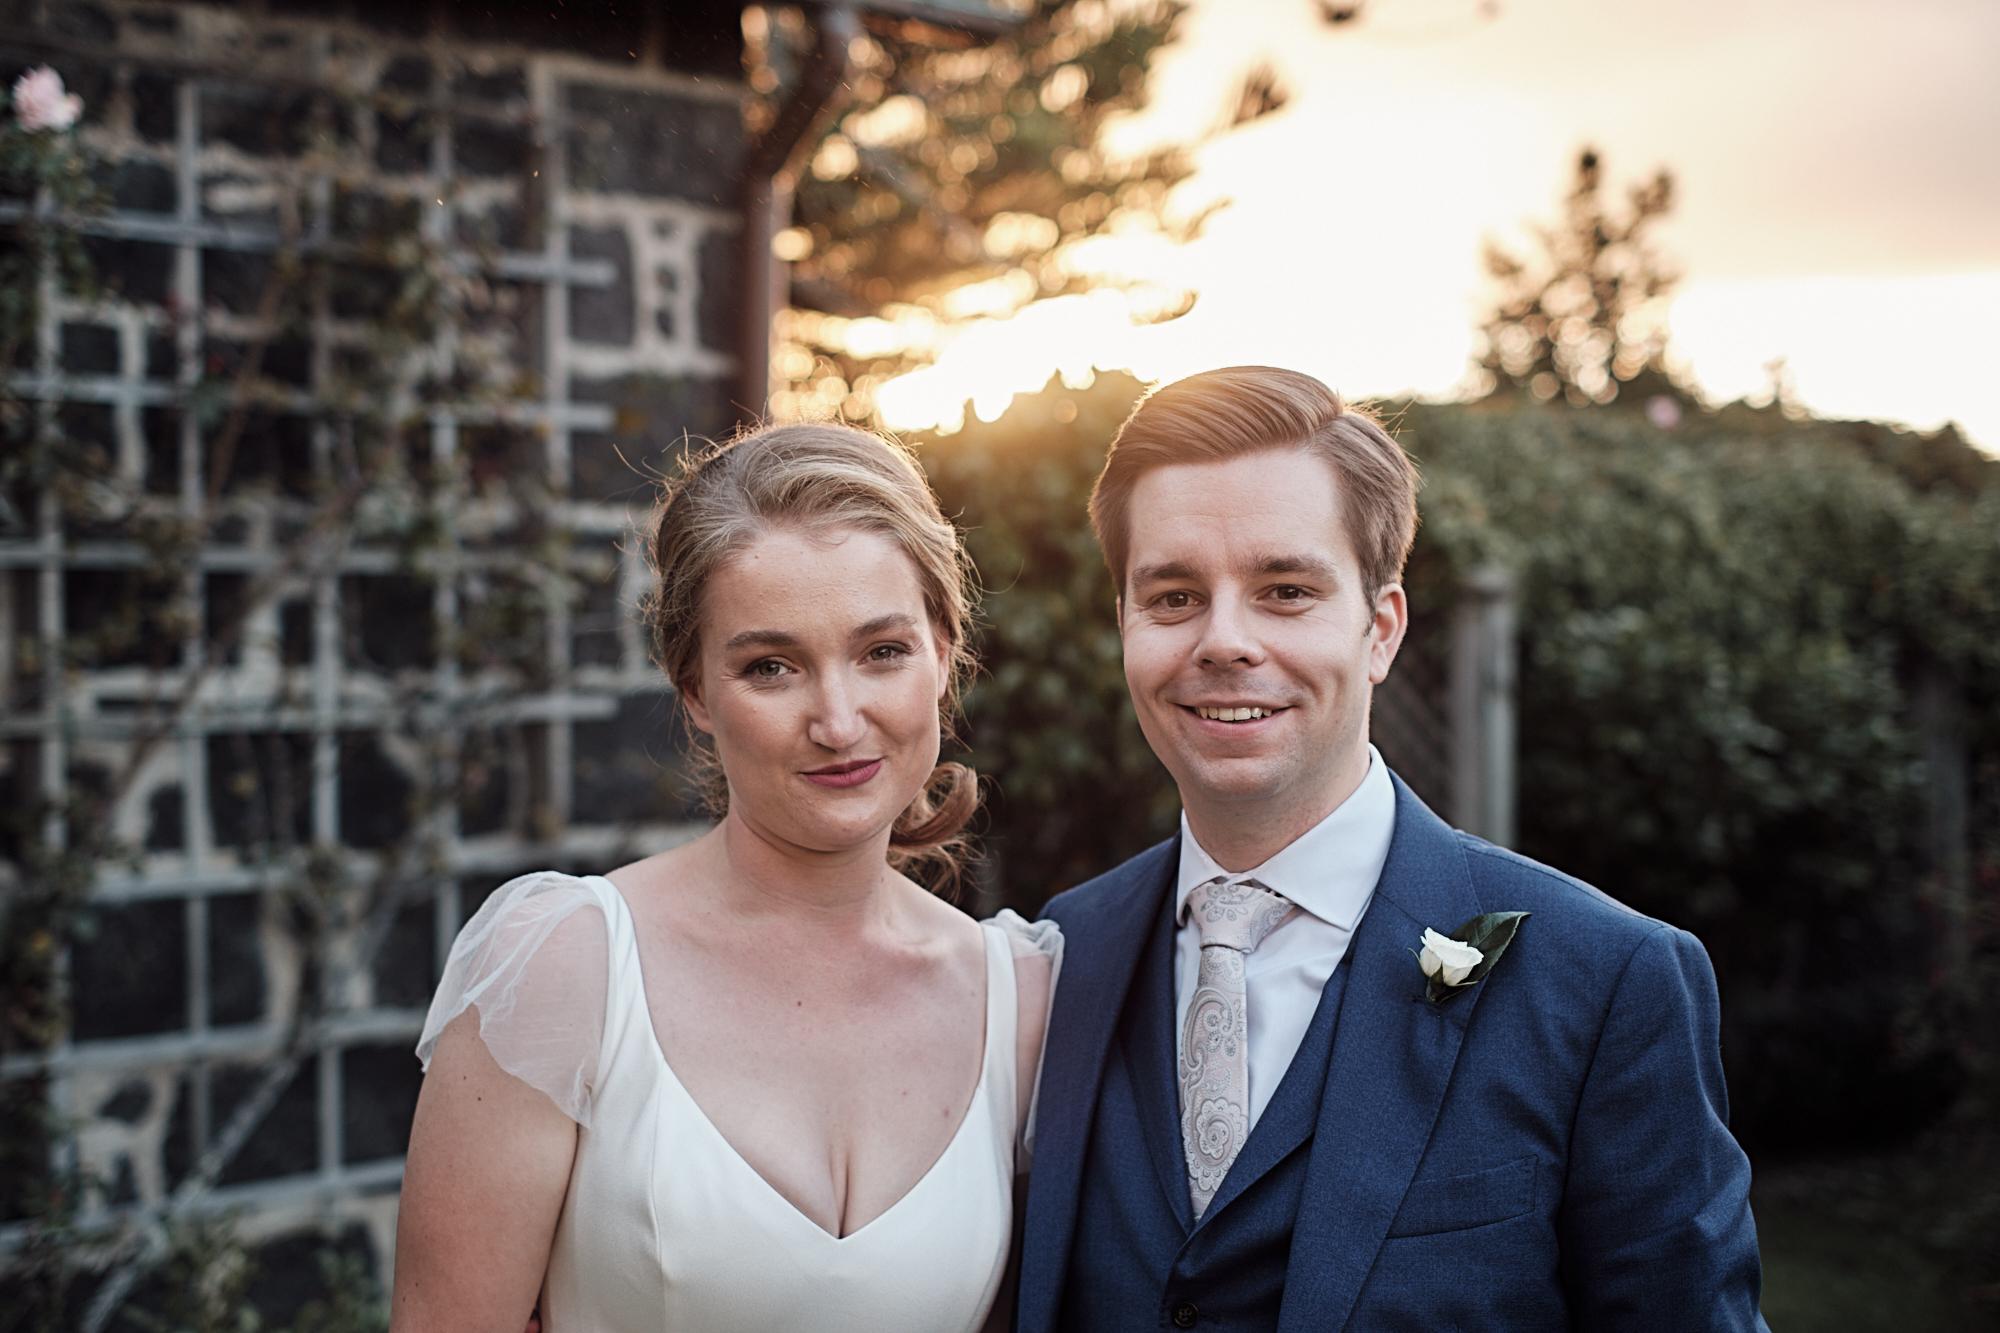 wedding photographers Auckland 87579